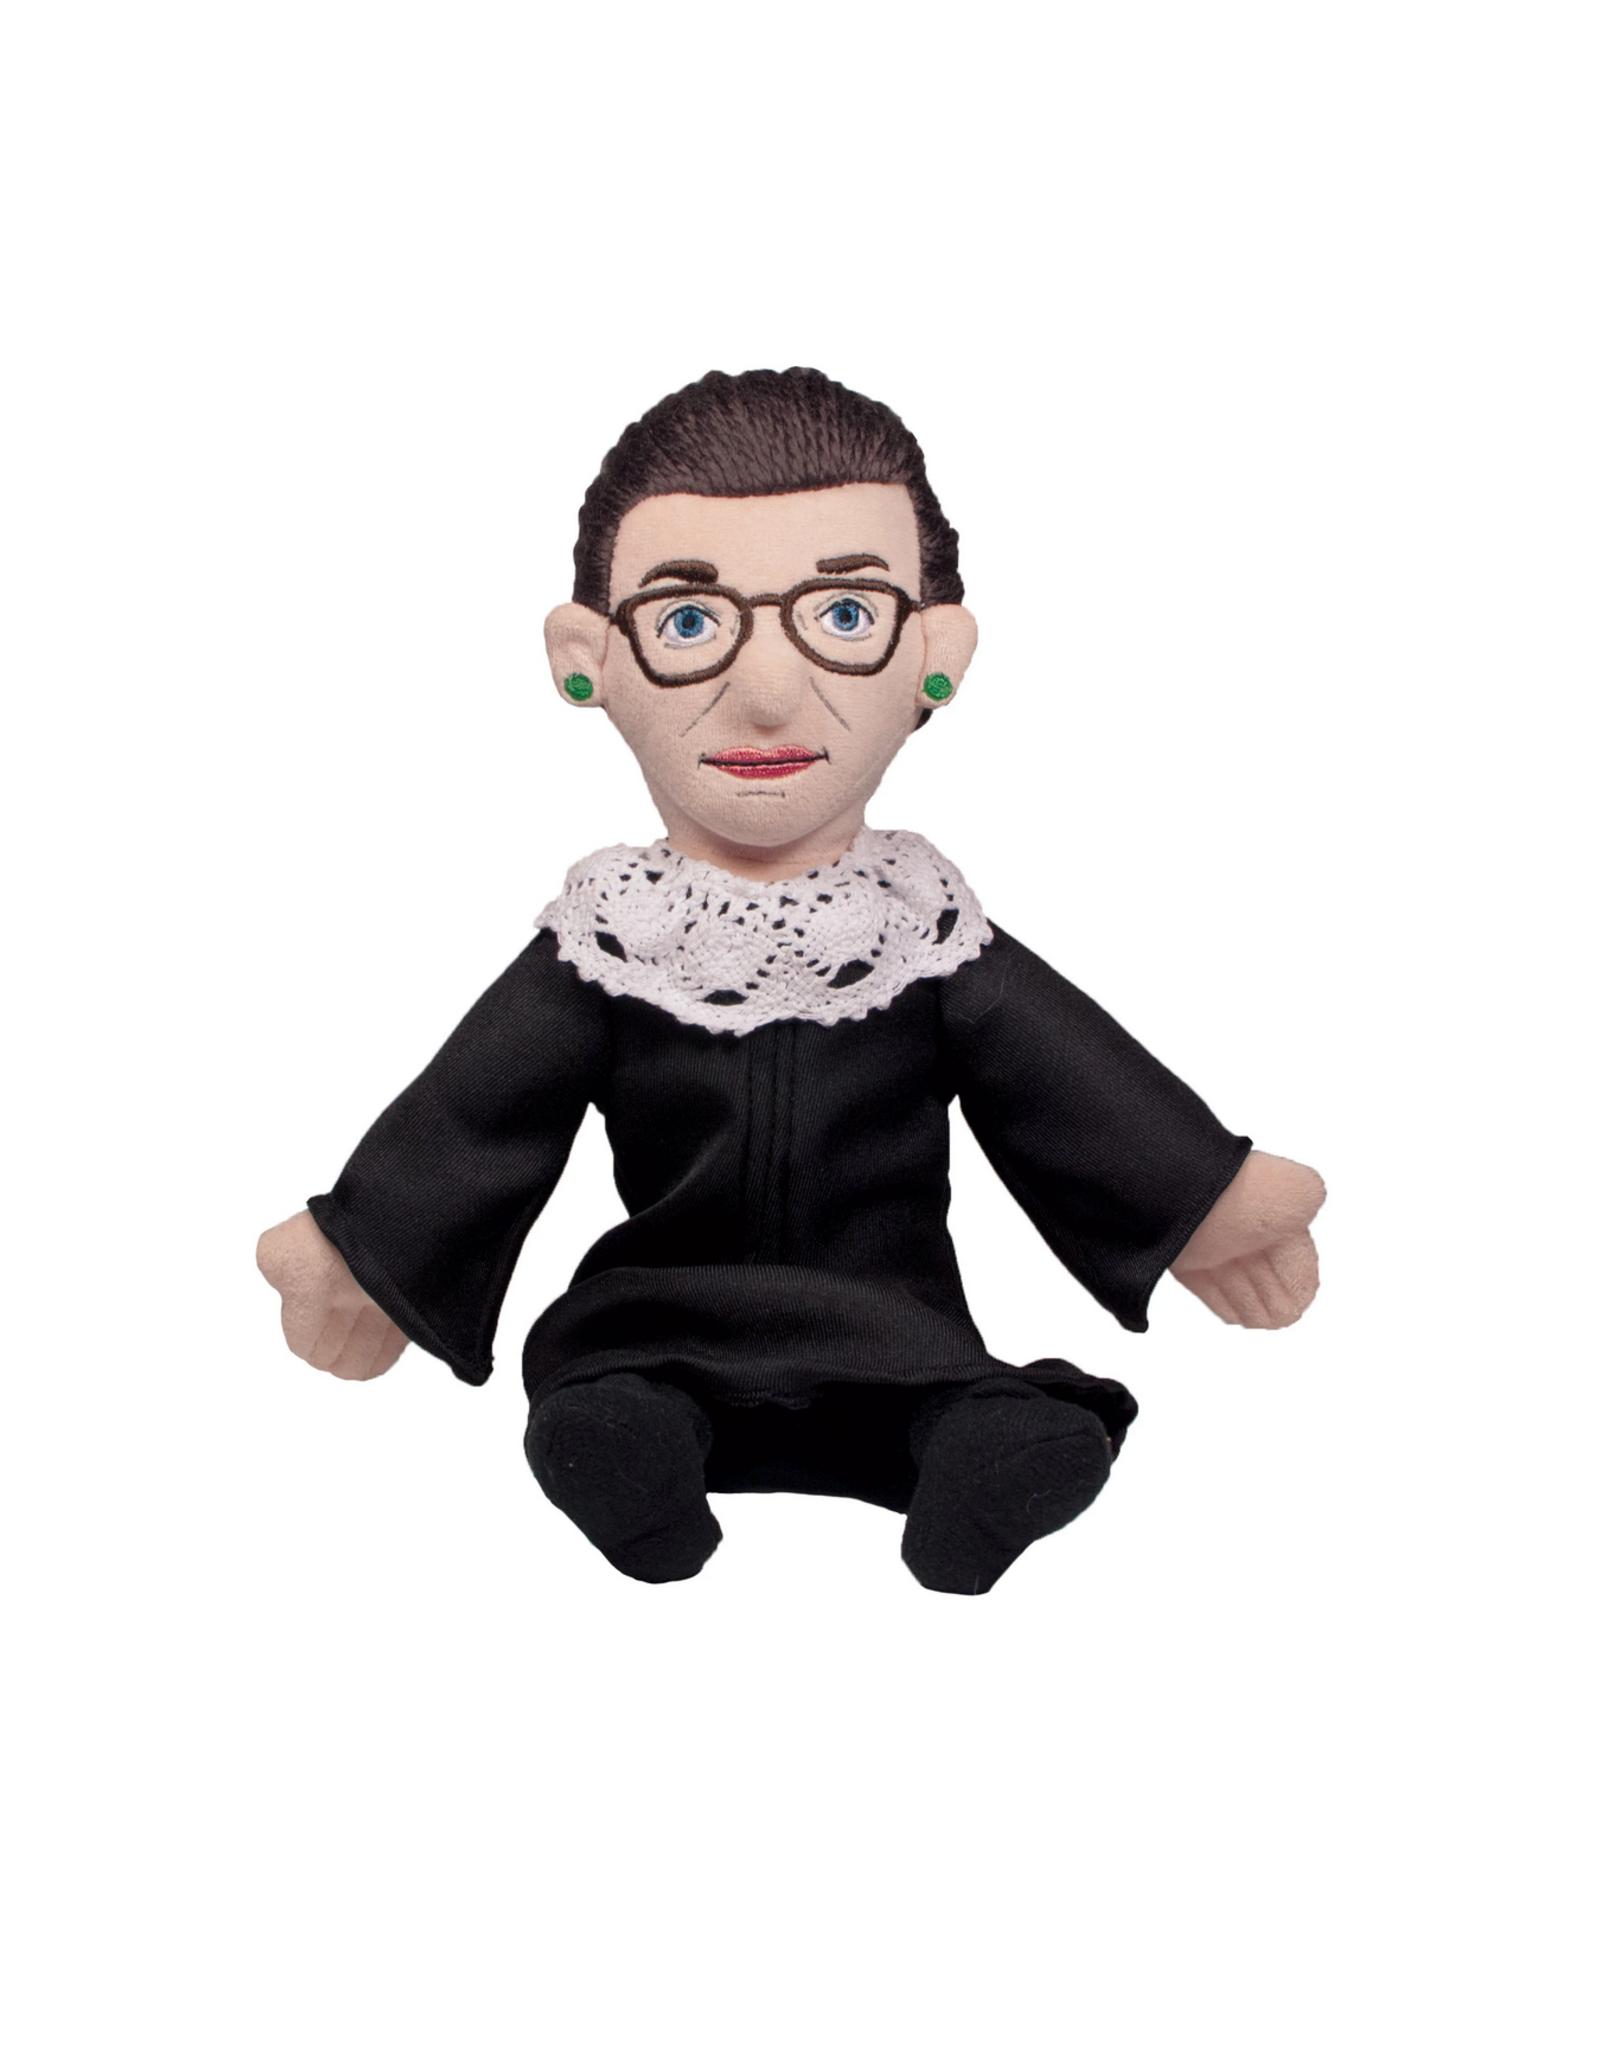 Ruth Bader Ginsburg Little Thinker